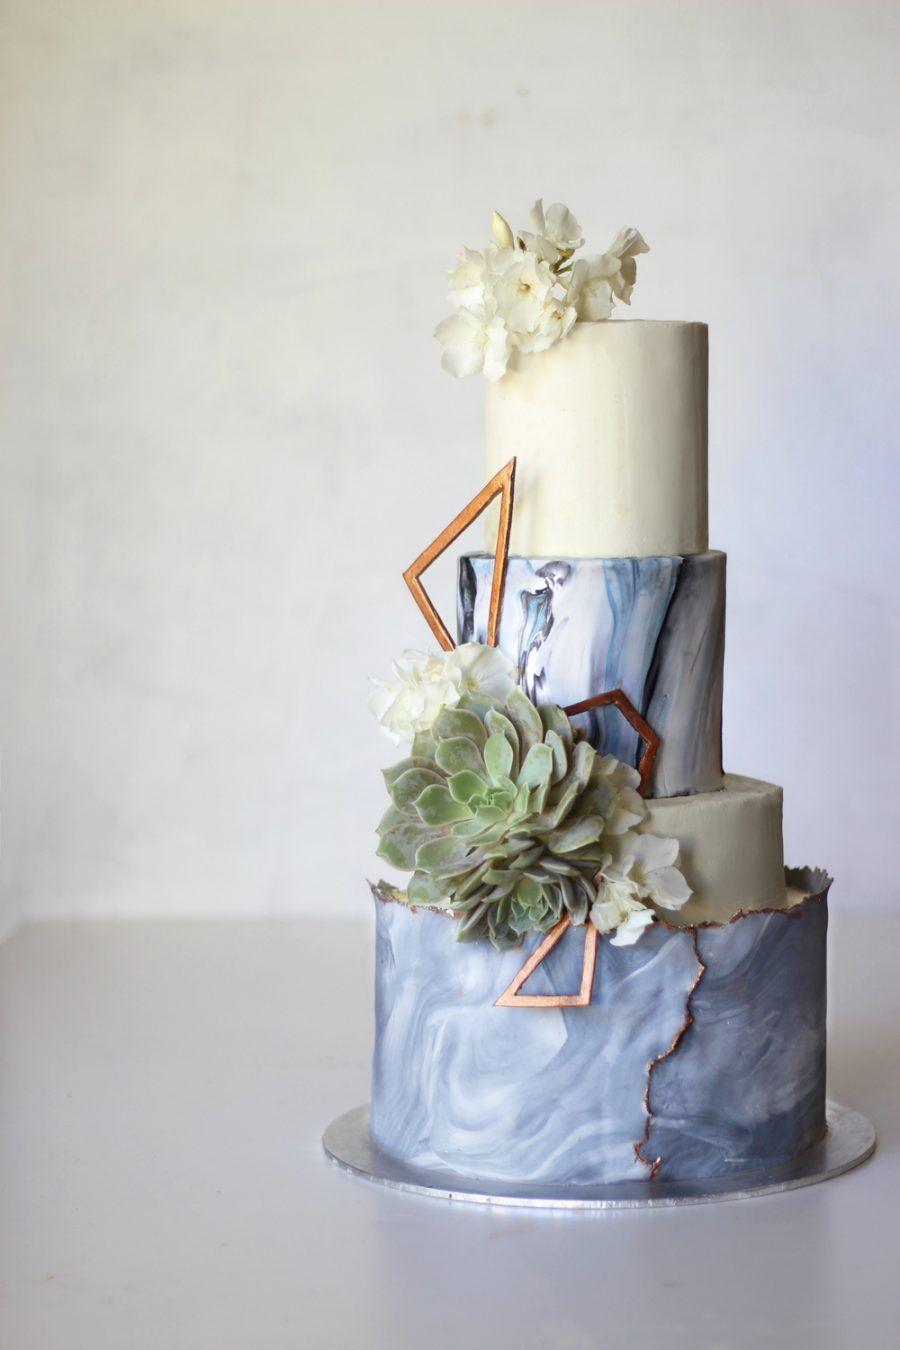 Sukar Creative Wedding Cakes And Desserts Perth Wa